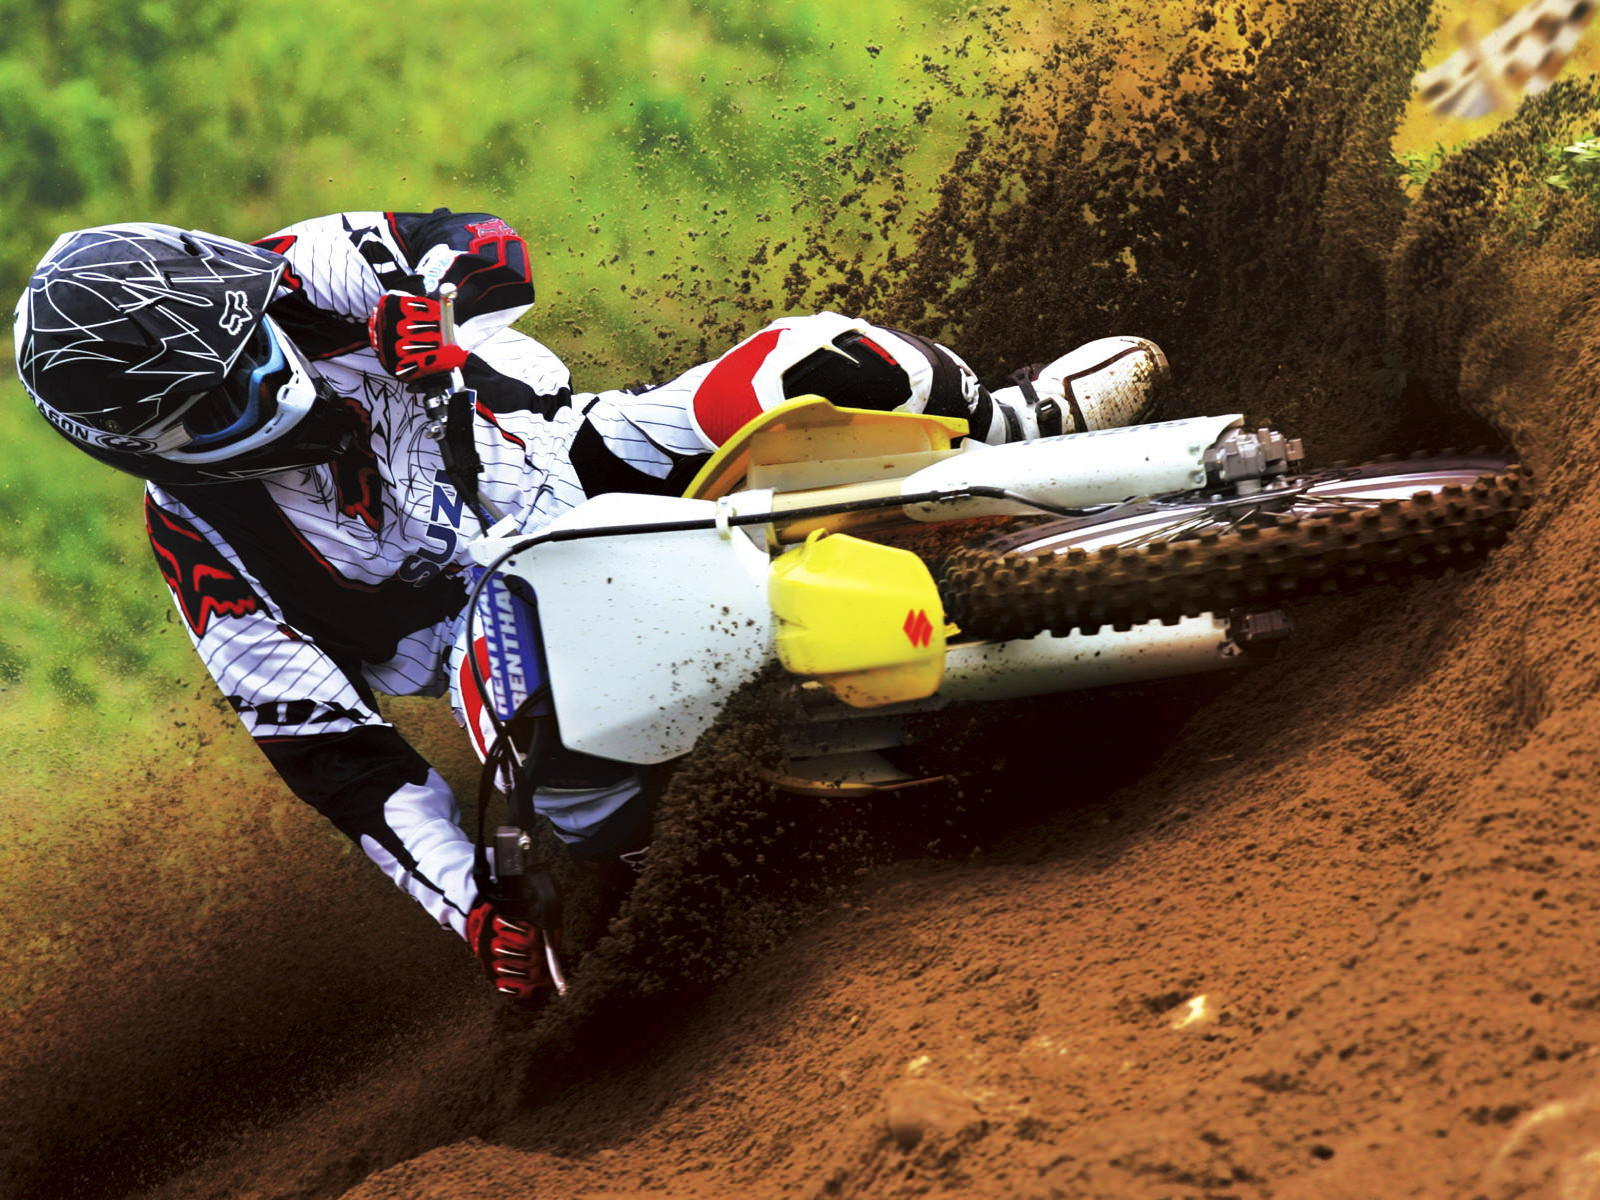 Off Road Moto Racing Wallpaper 1600x1200 1600x1200